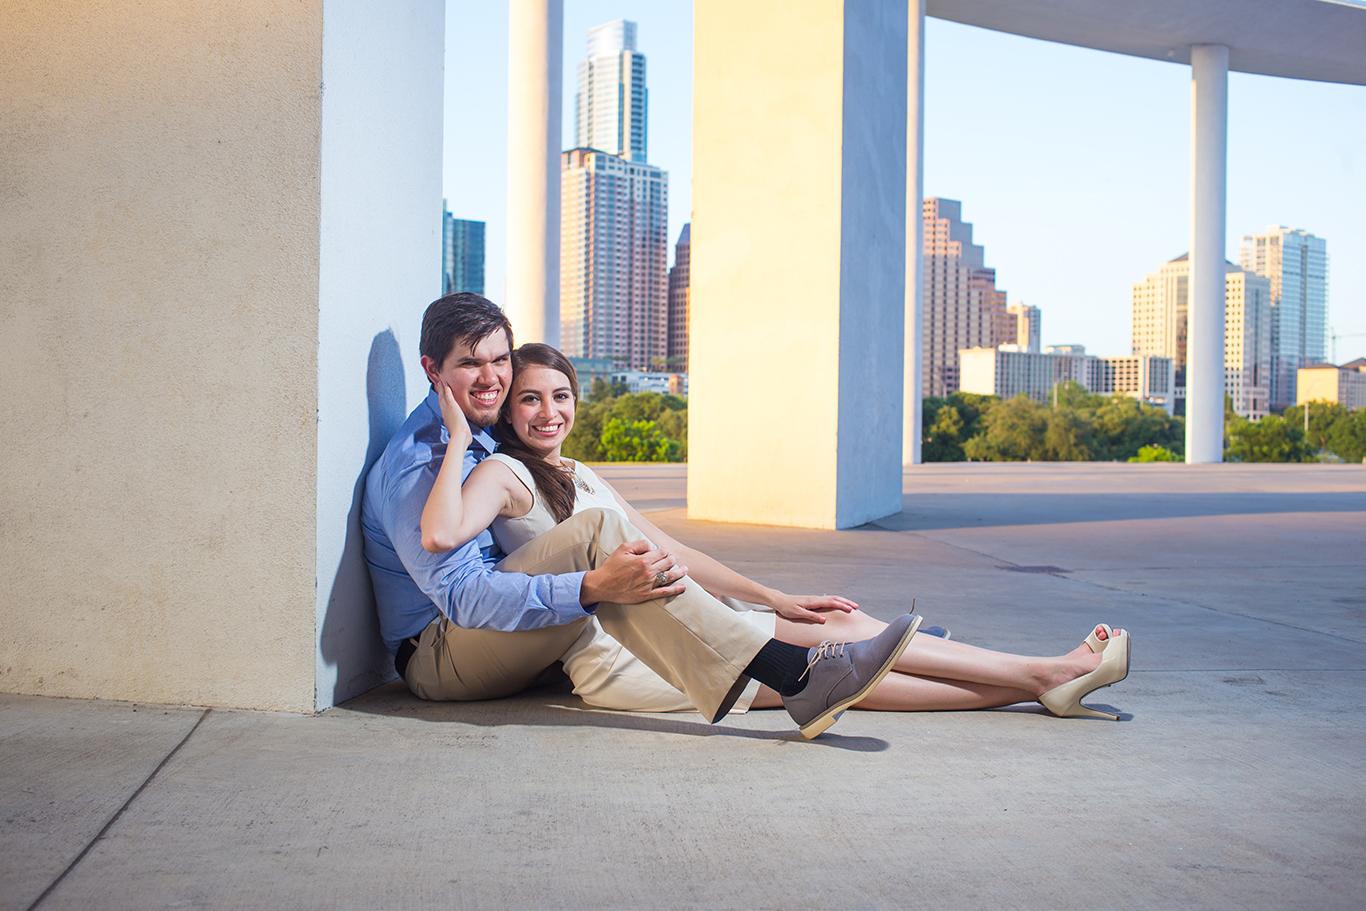 city of austin engagement photo